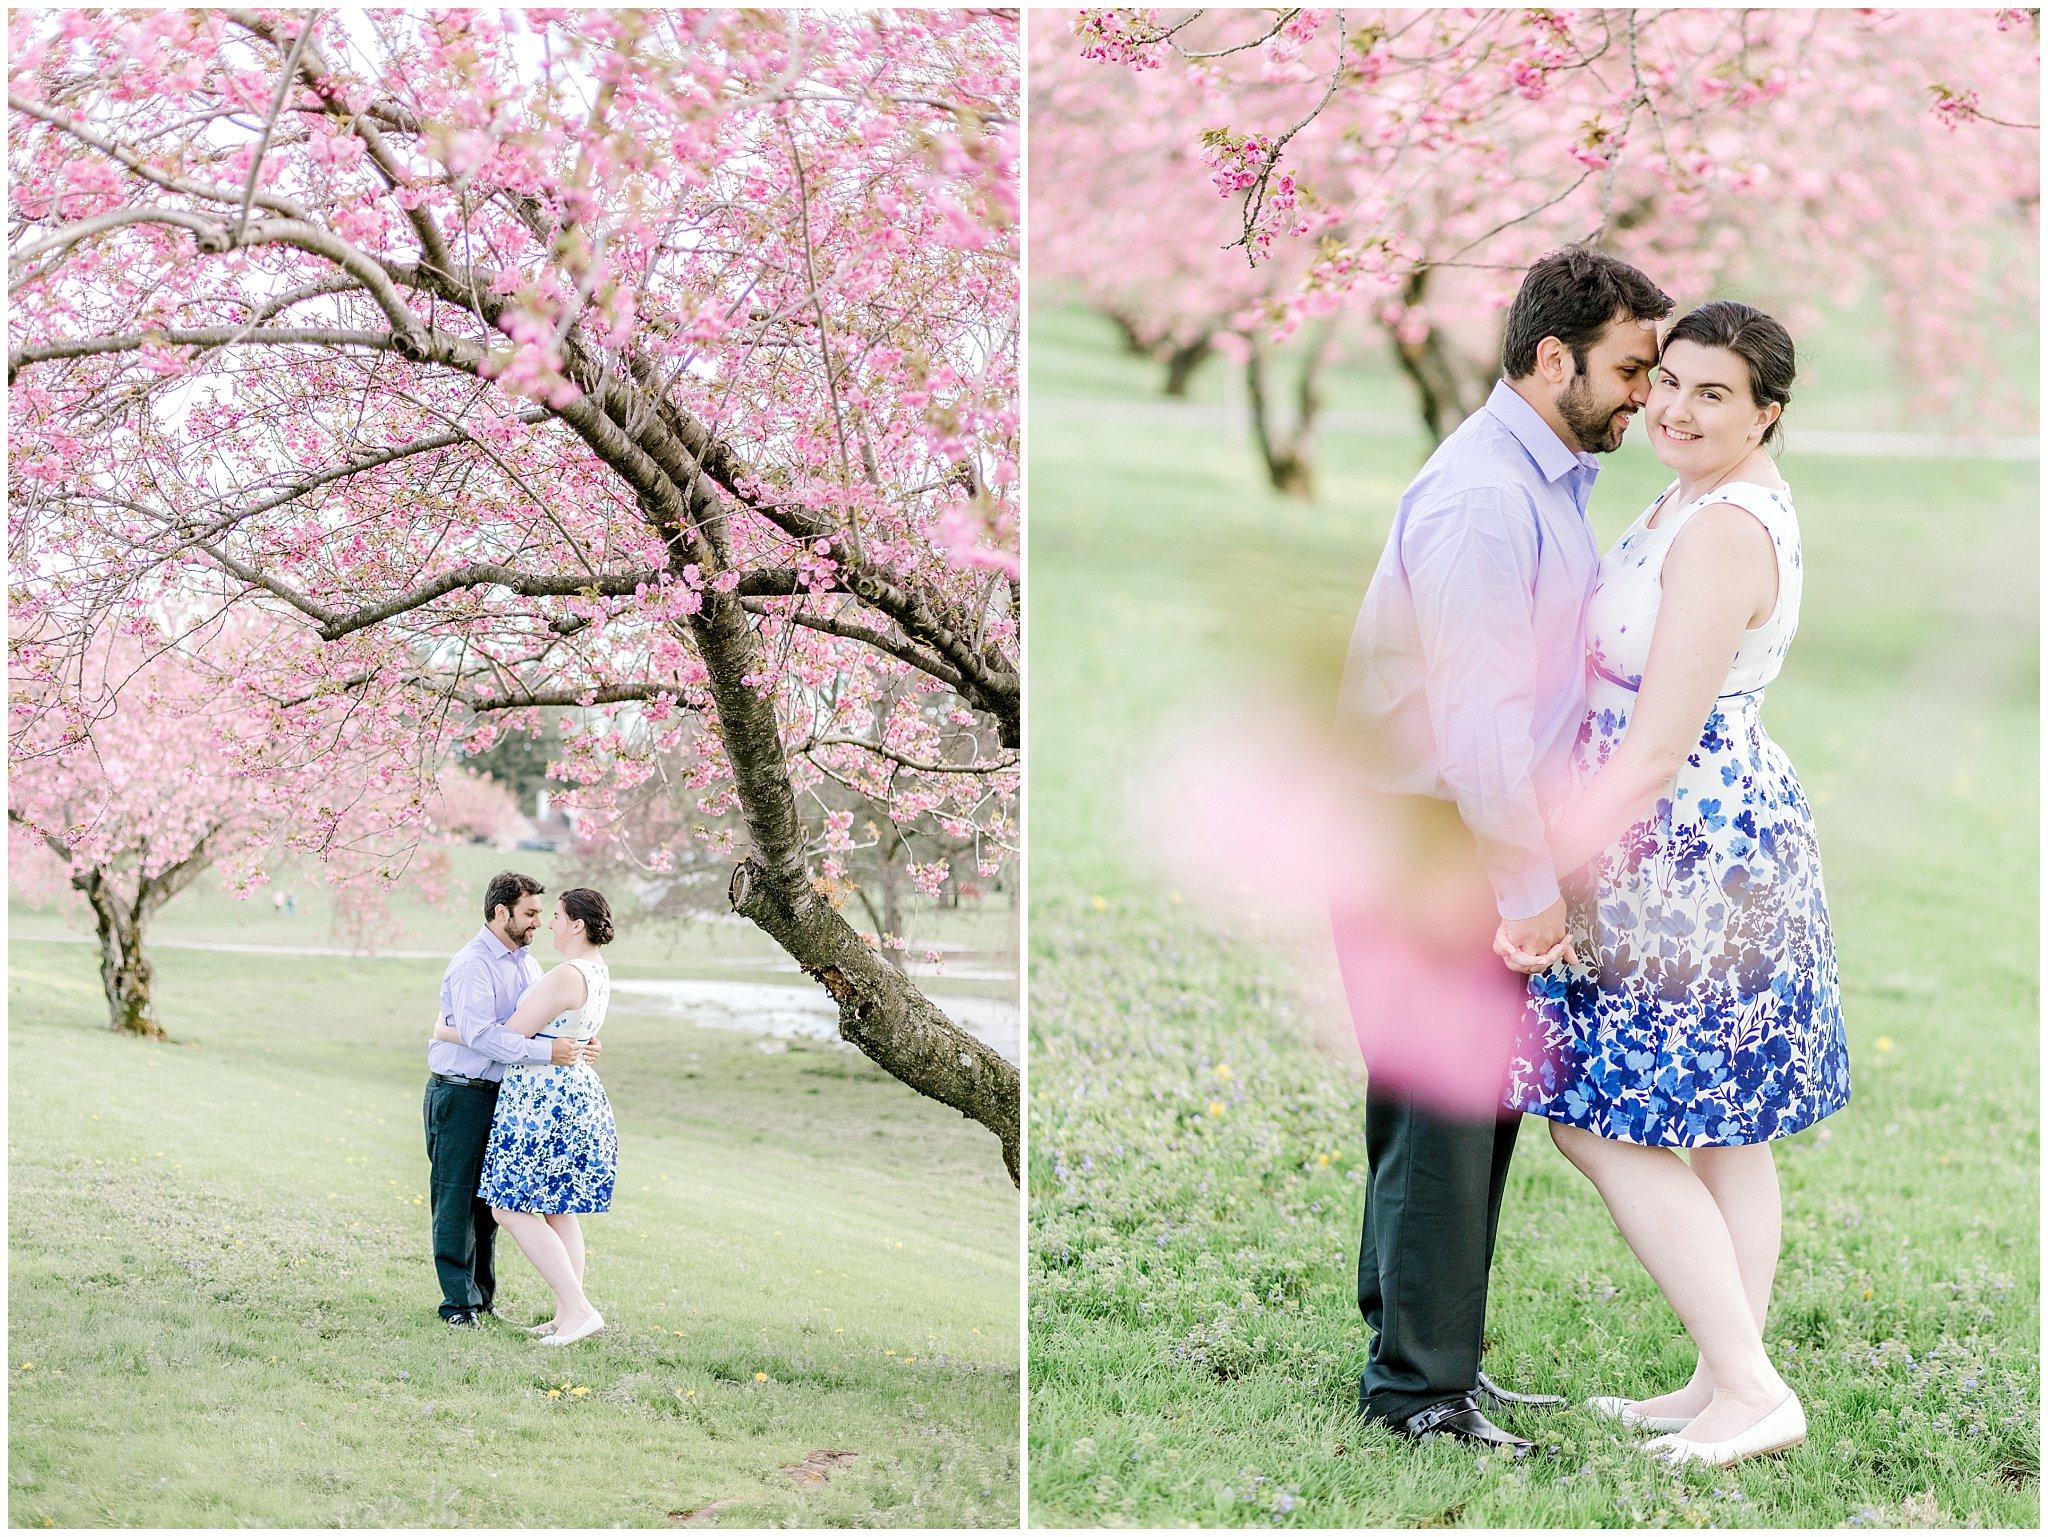 Lehigh Valley Spring Cherry Blossom Engagement Session Pennsylvania Wedding Photographer (13).jpg